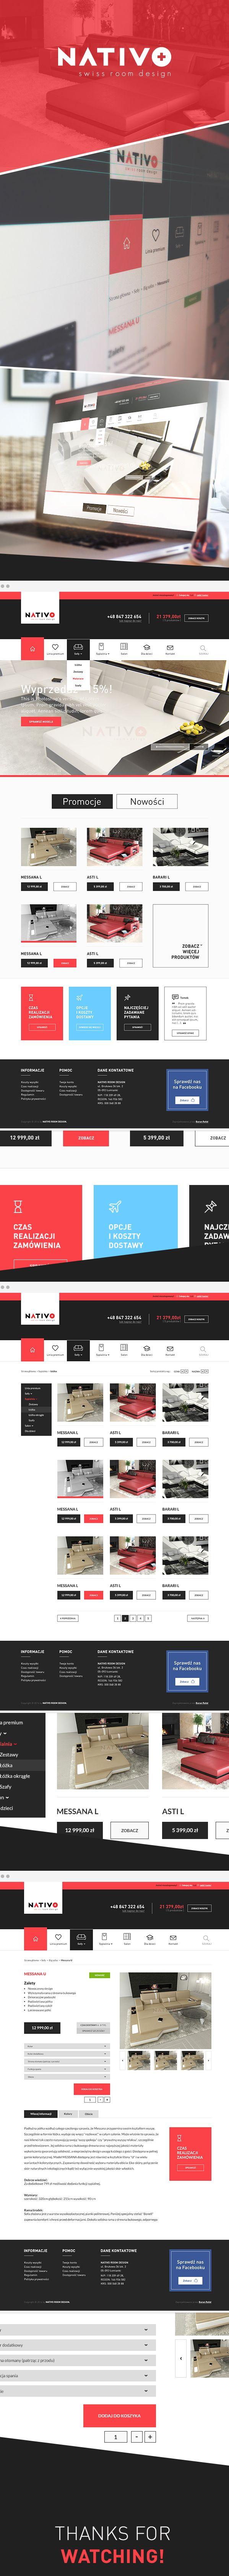 NATIVO - furniture store by Rafał Baran, via Behance